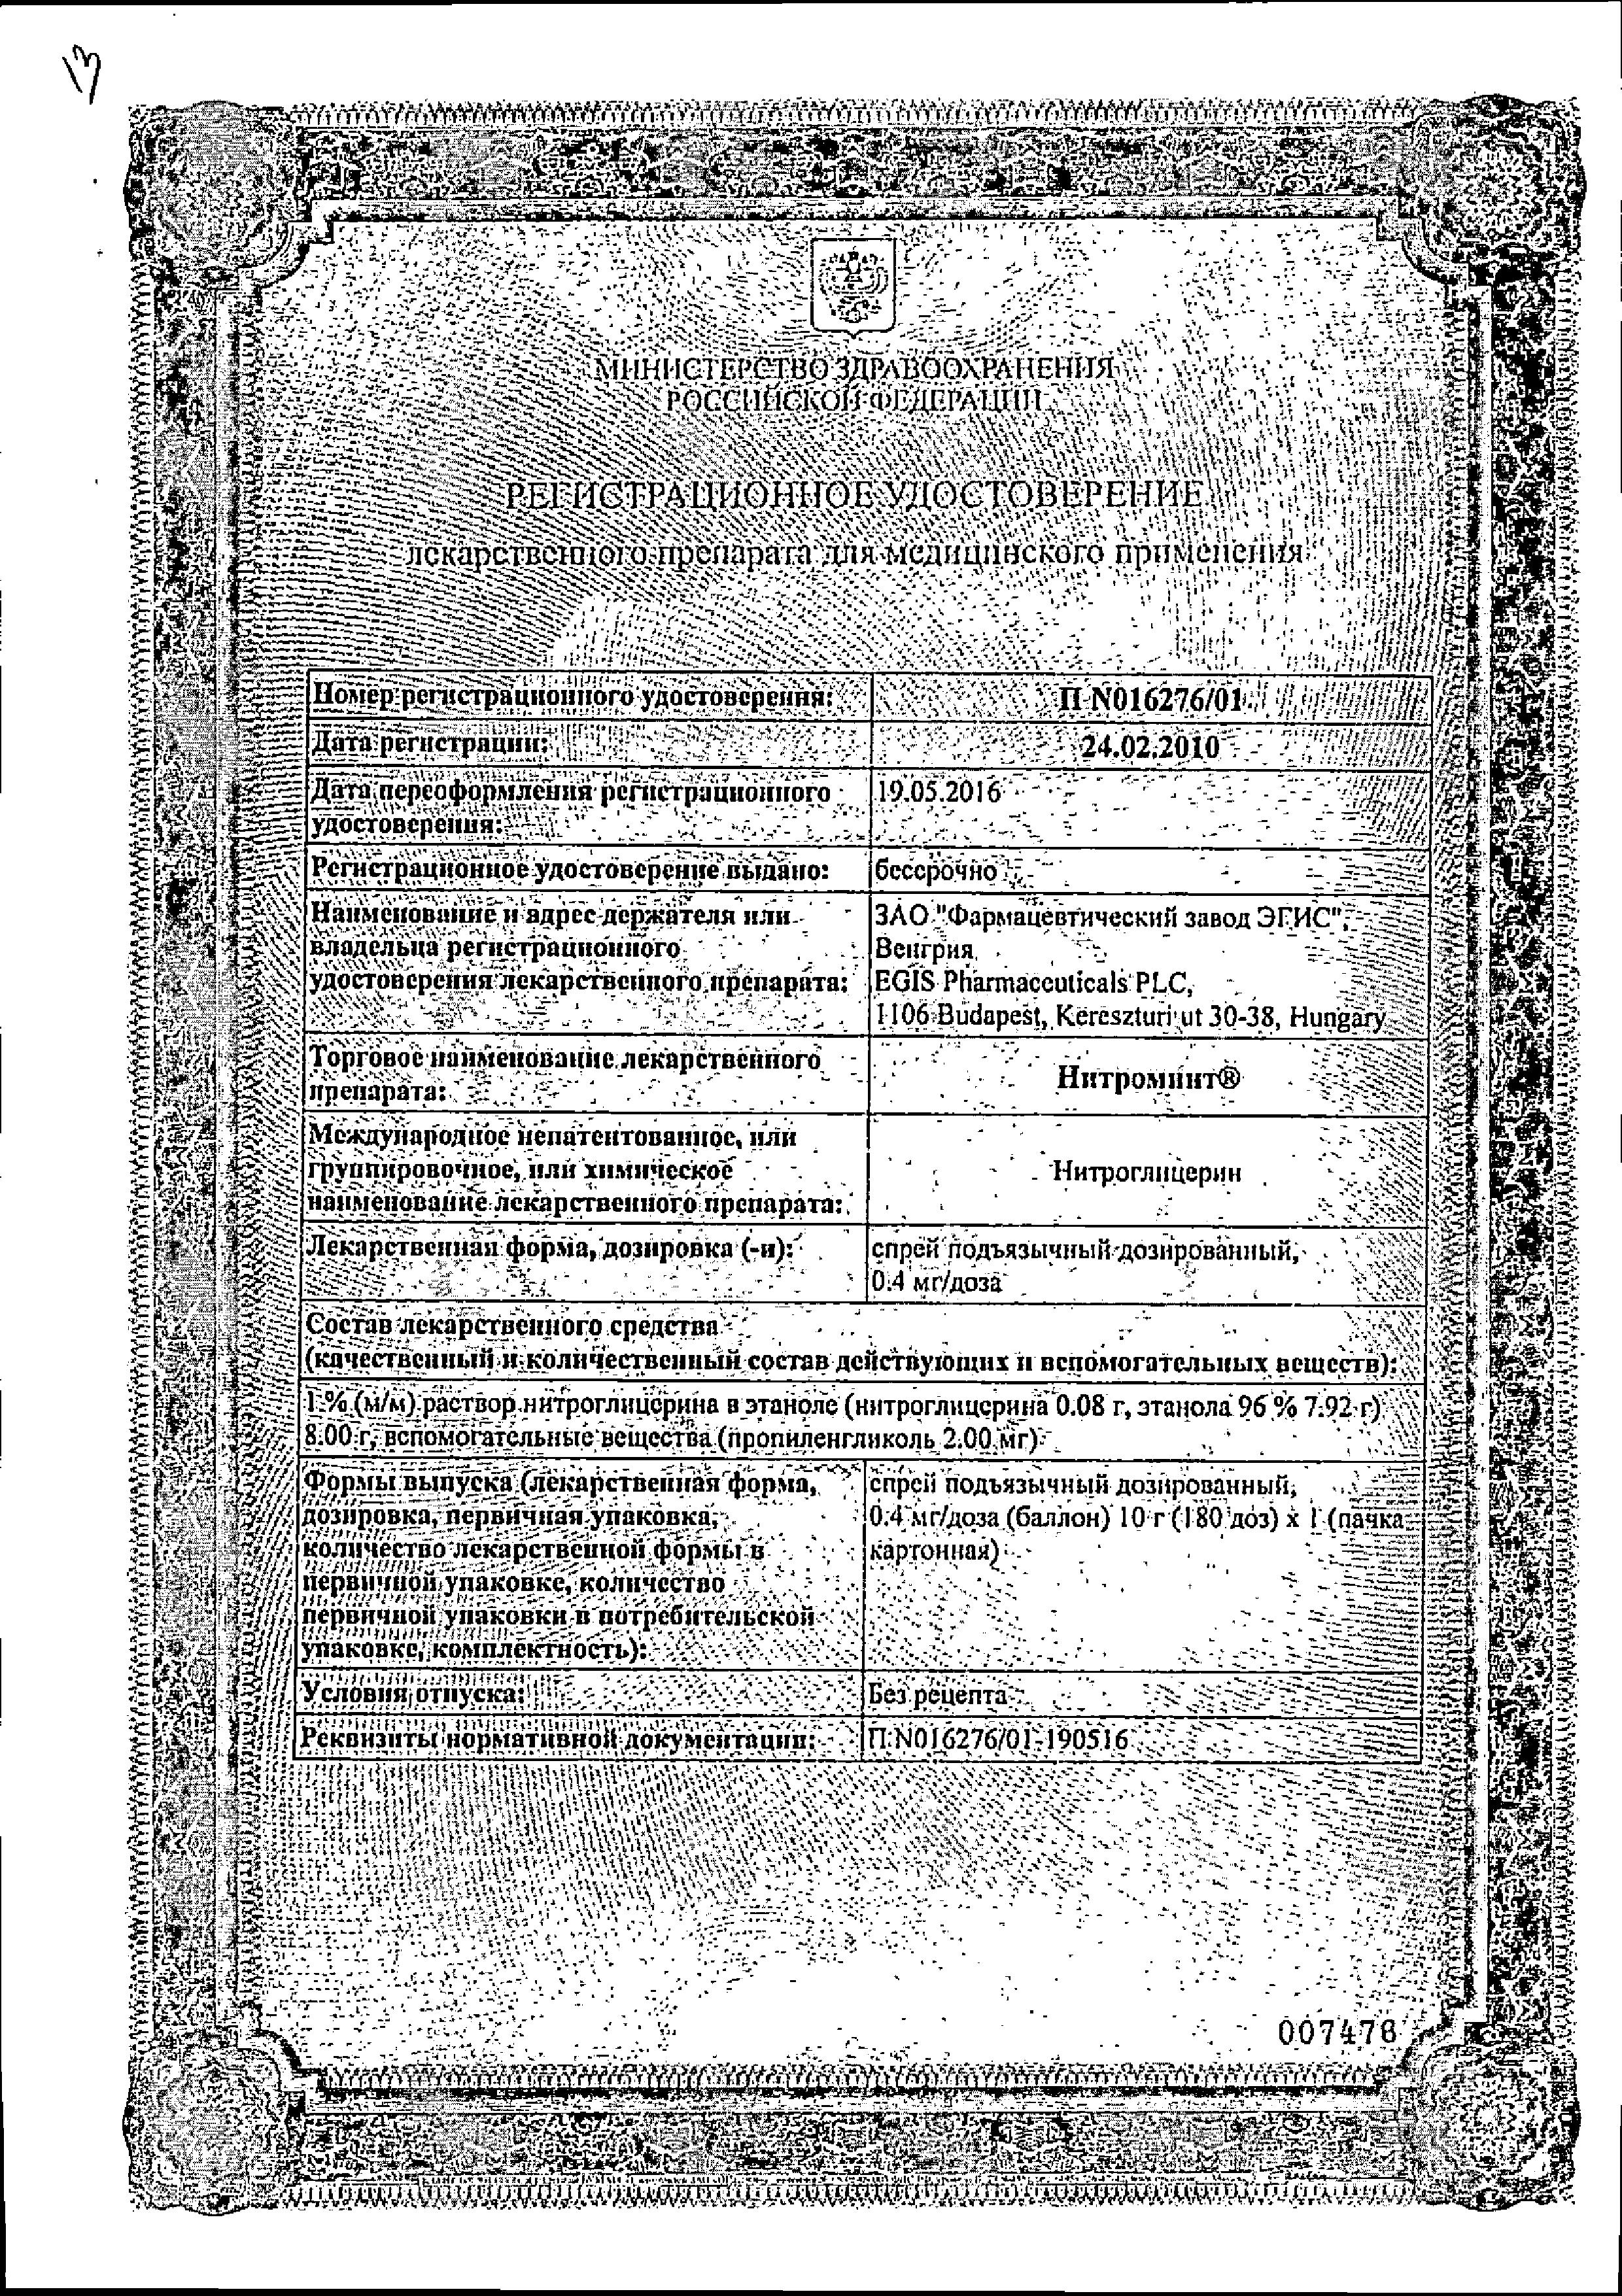 Нитроминт сертификат